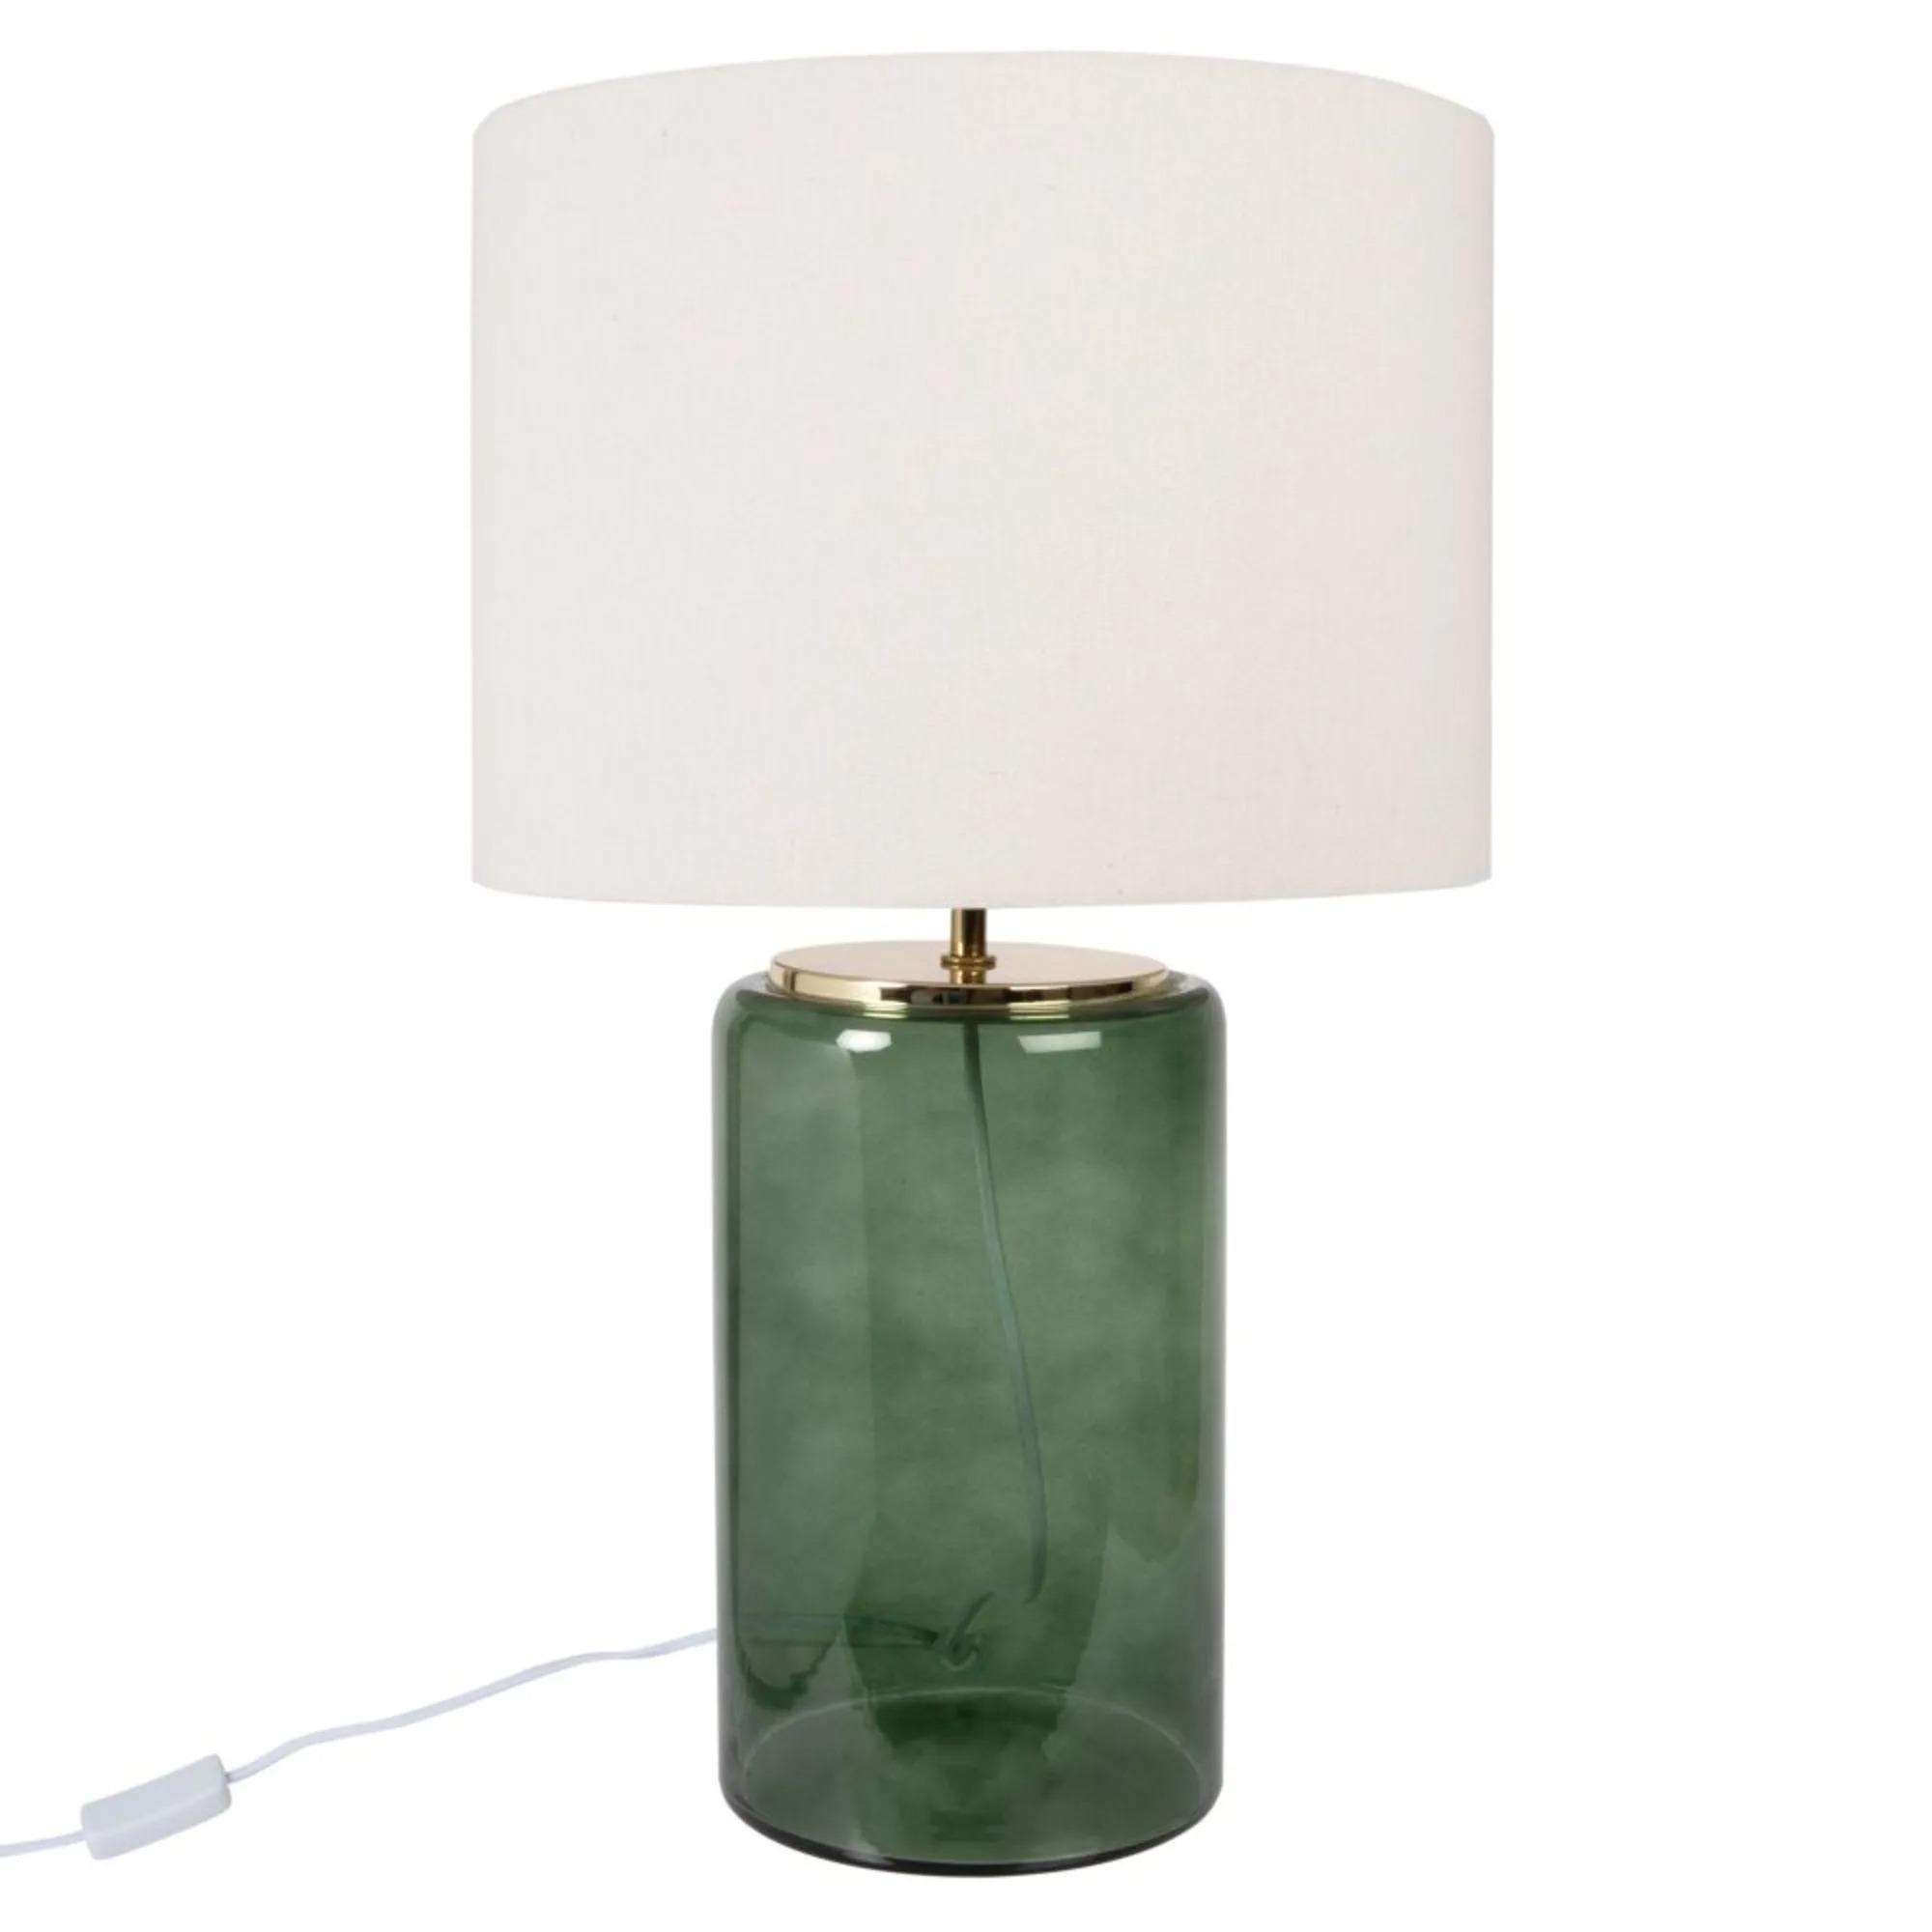 Lámpara de cristal tintado verde con pantalla de lino beige.